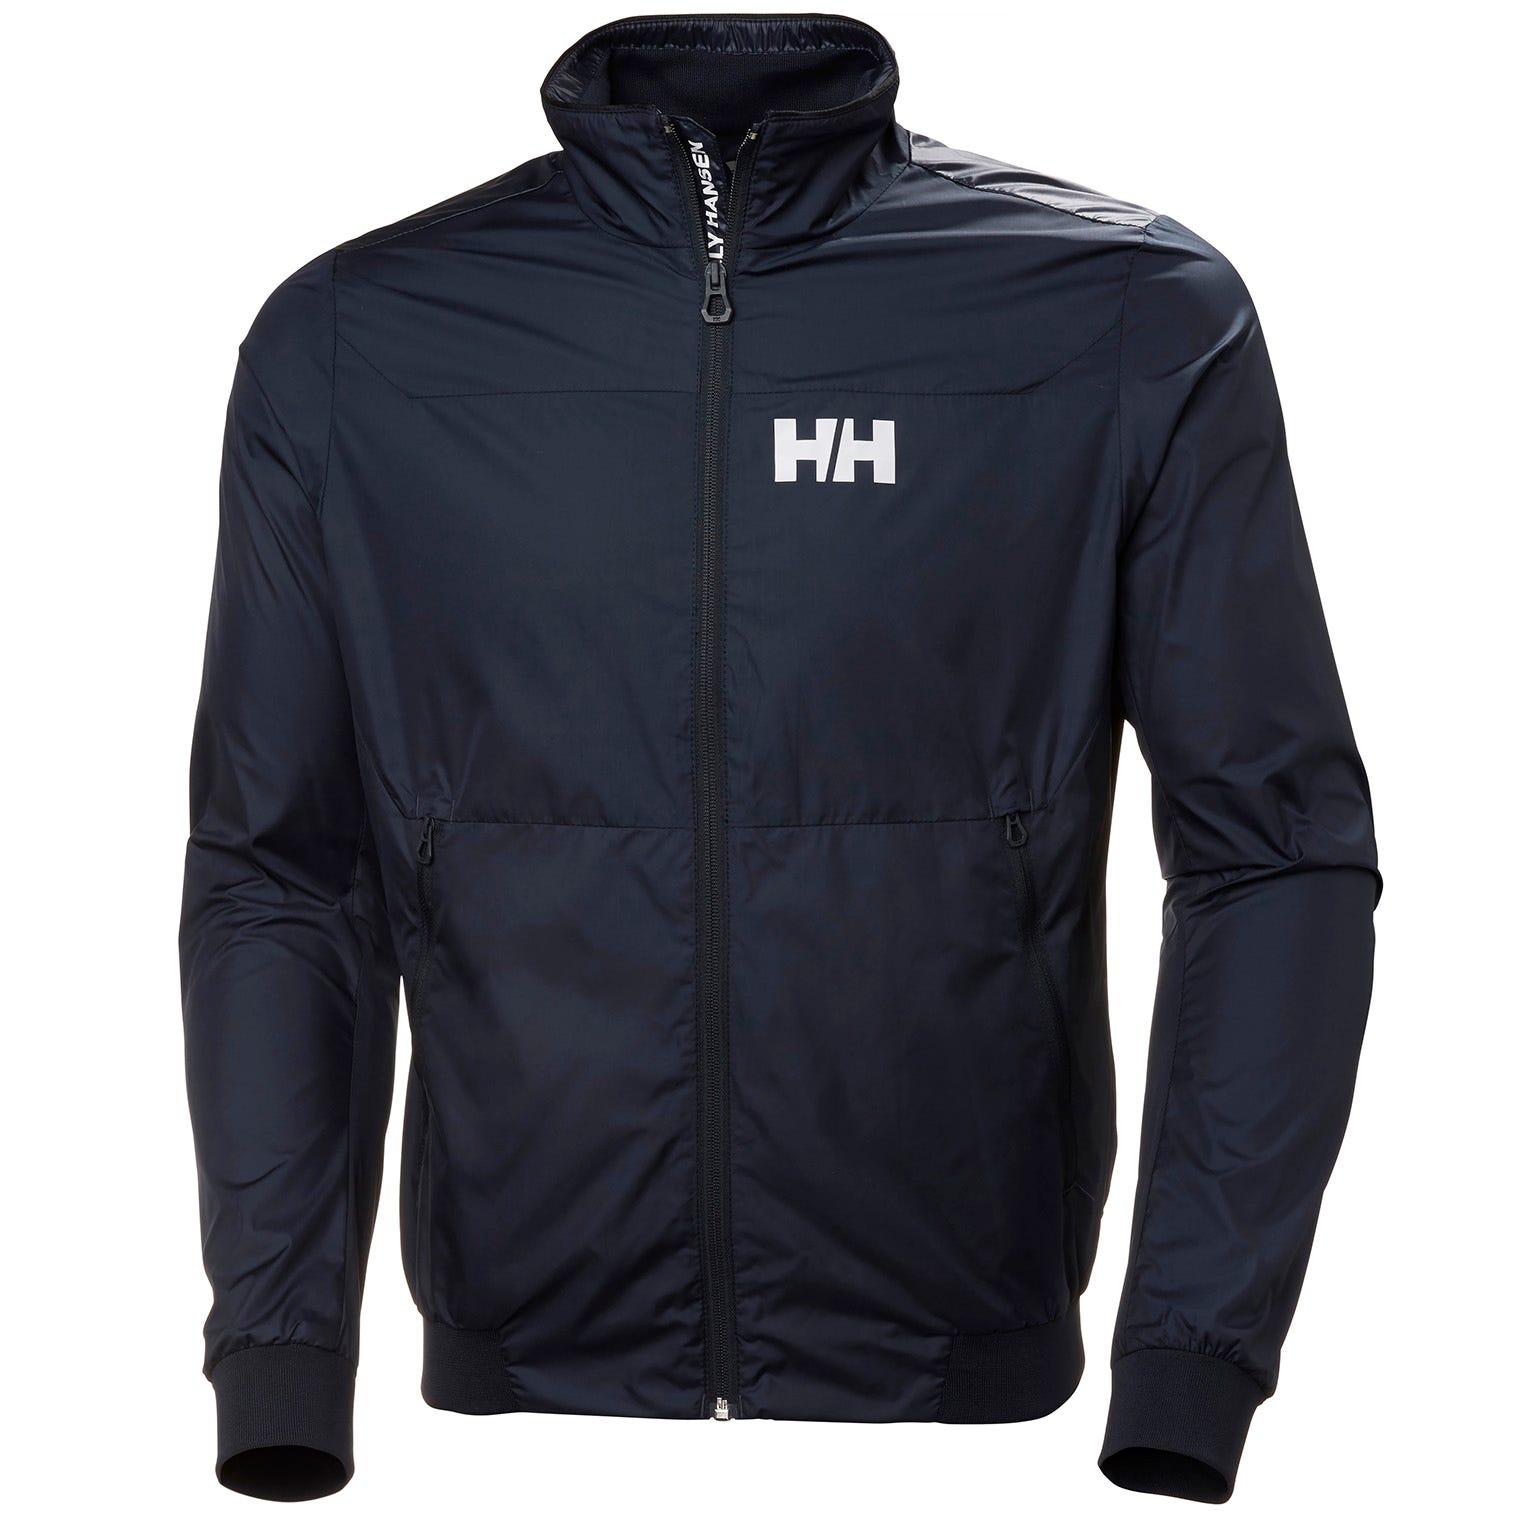 Helly Hansen Mens Crew Windbreaker Sailing Jacket Navy XL